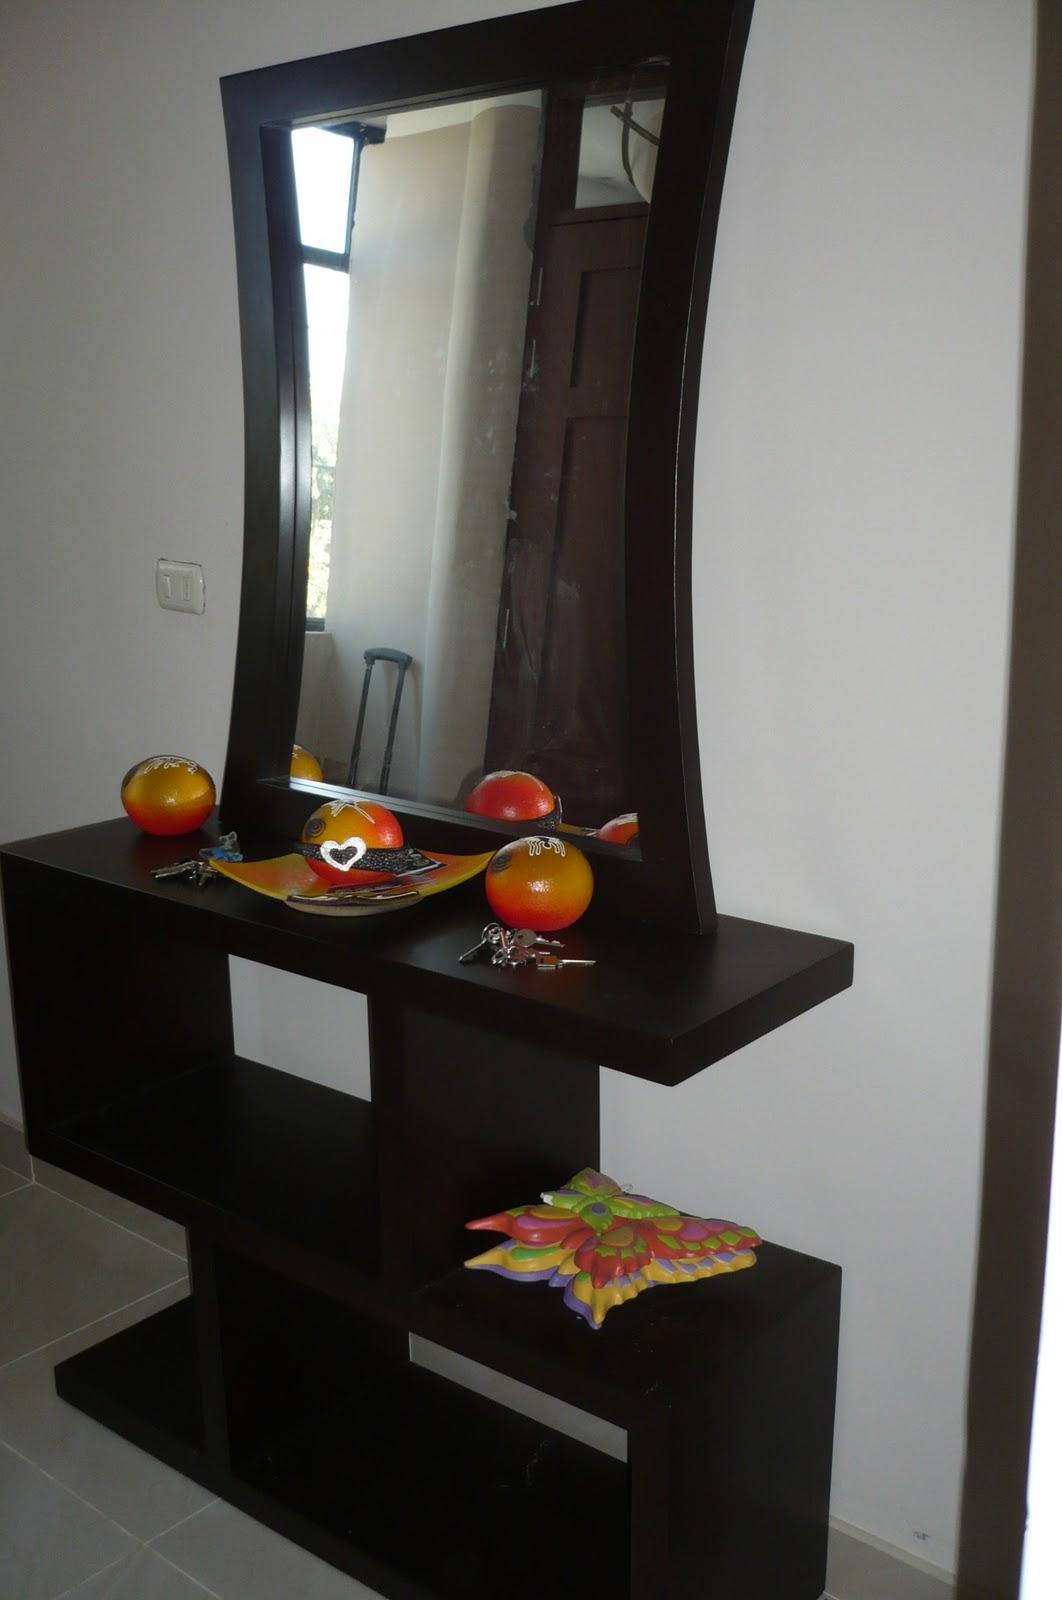 Muebles chiclayo muebles peru mueblerias en el peru for Muebleria el mueble